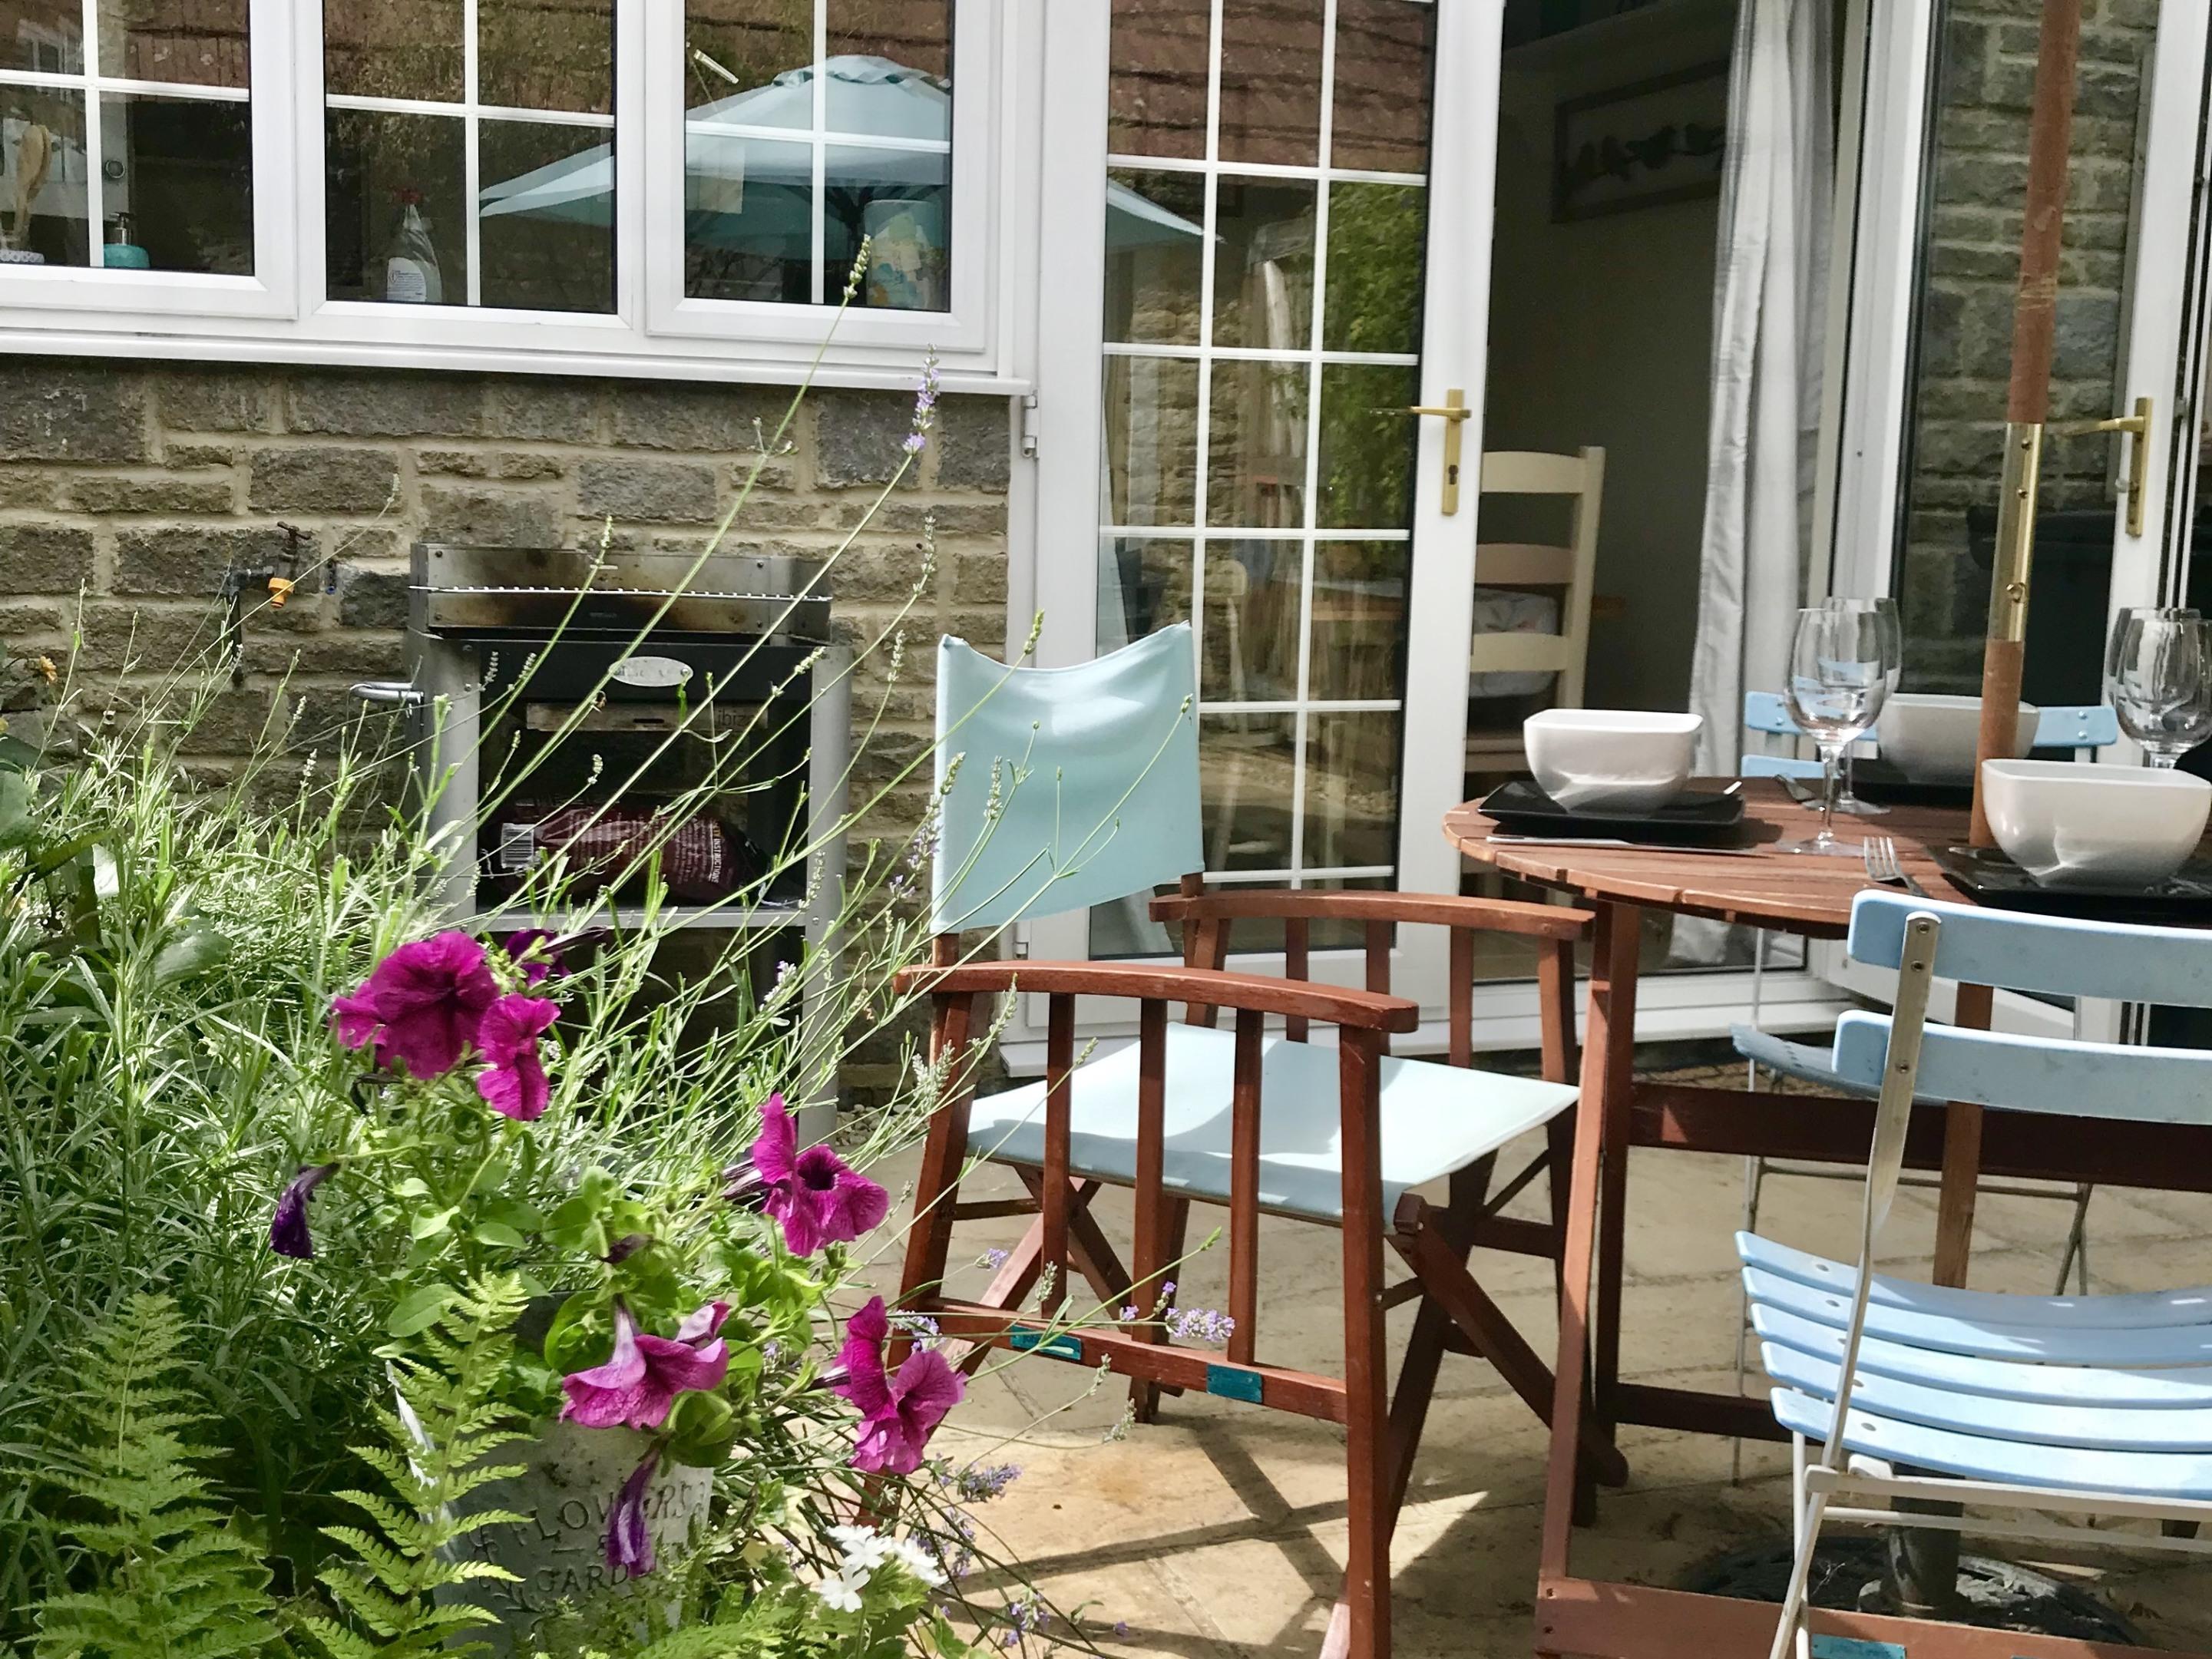 Cottage-Premium-Private Bathroom-Street View-Way Cottage